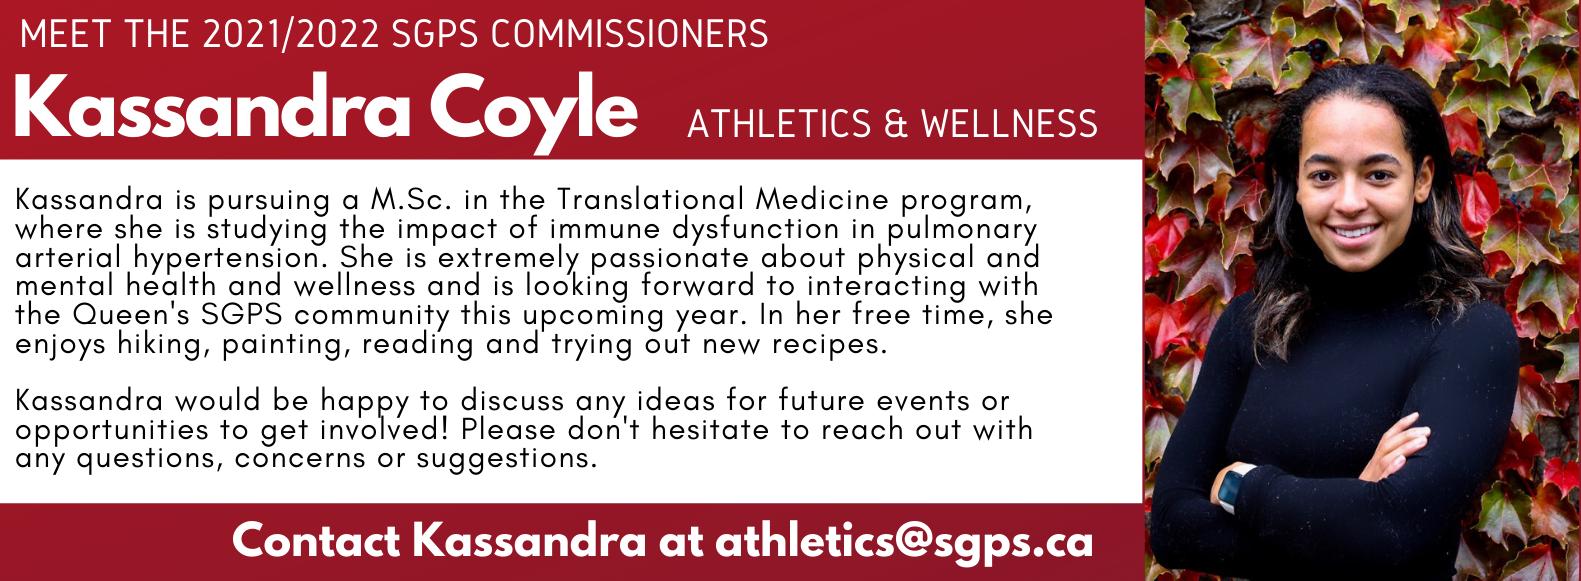 Kassandra Coyle, SGPS Athletics & Wellness Commissioner. Contact Kassandra at athletics@sgps.ca